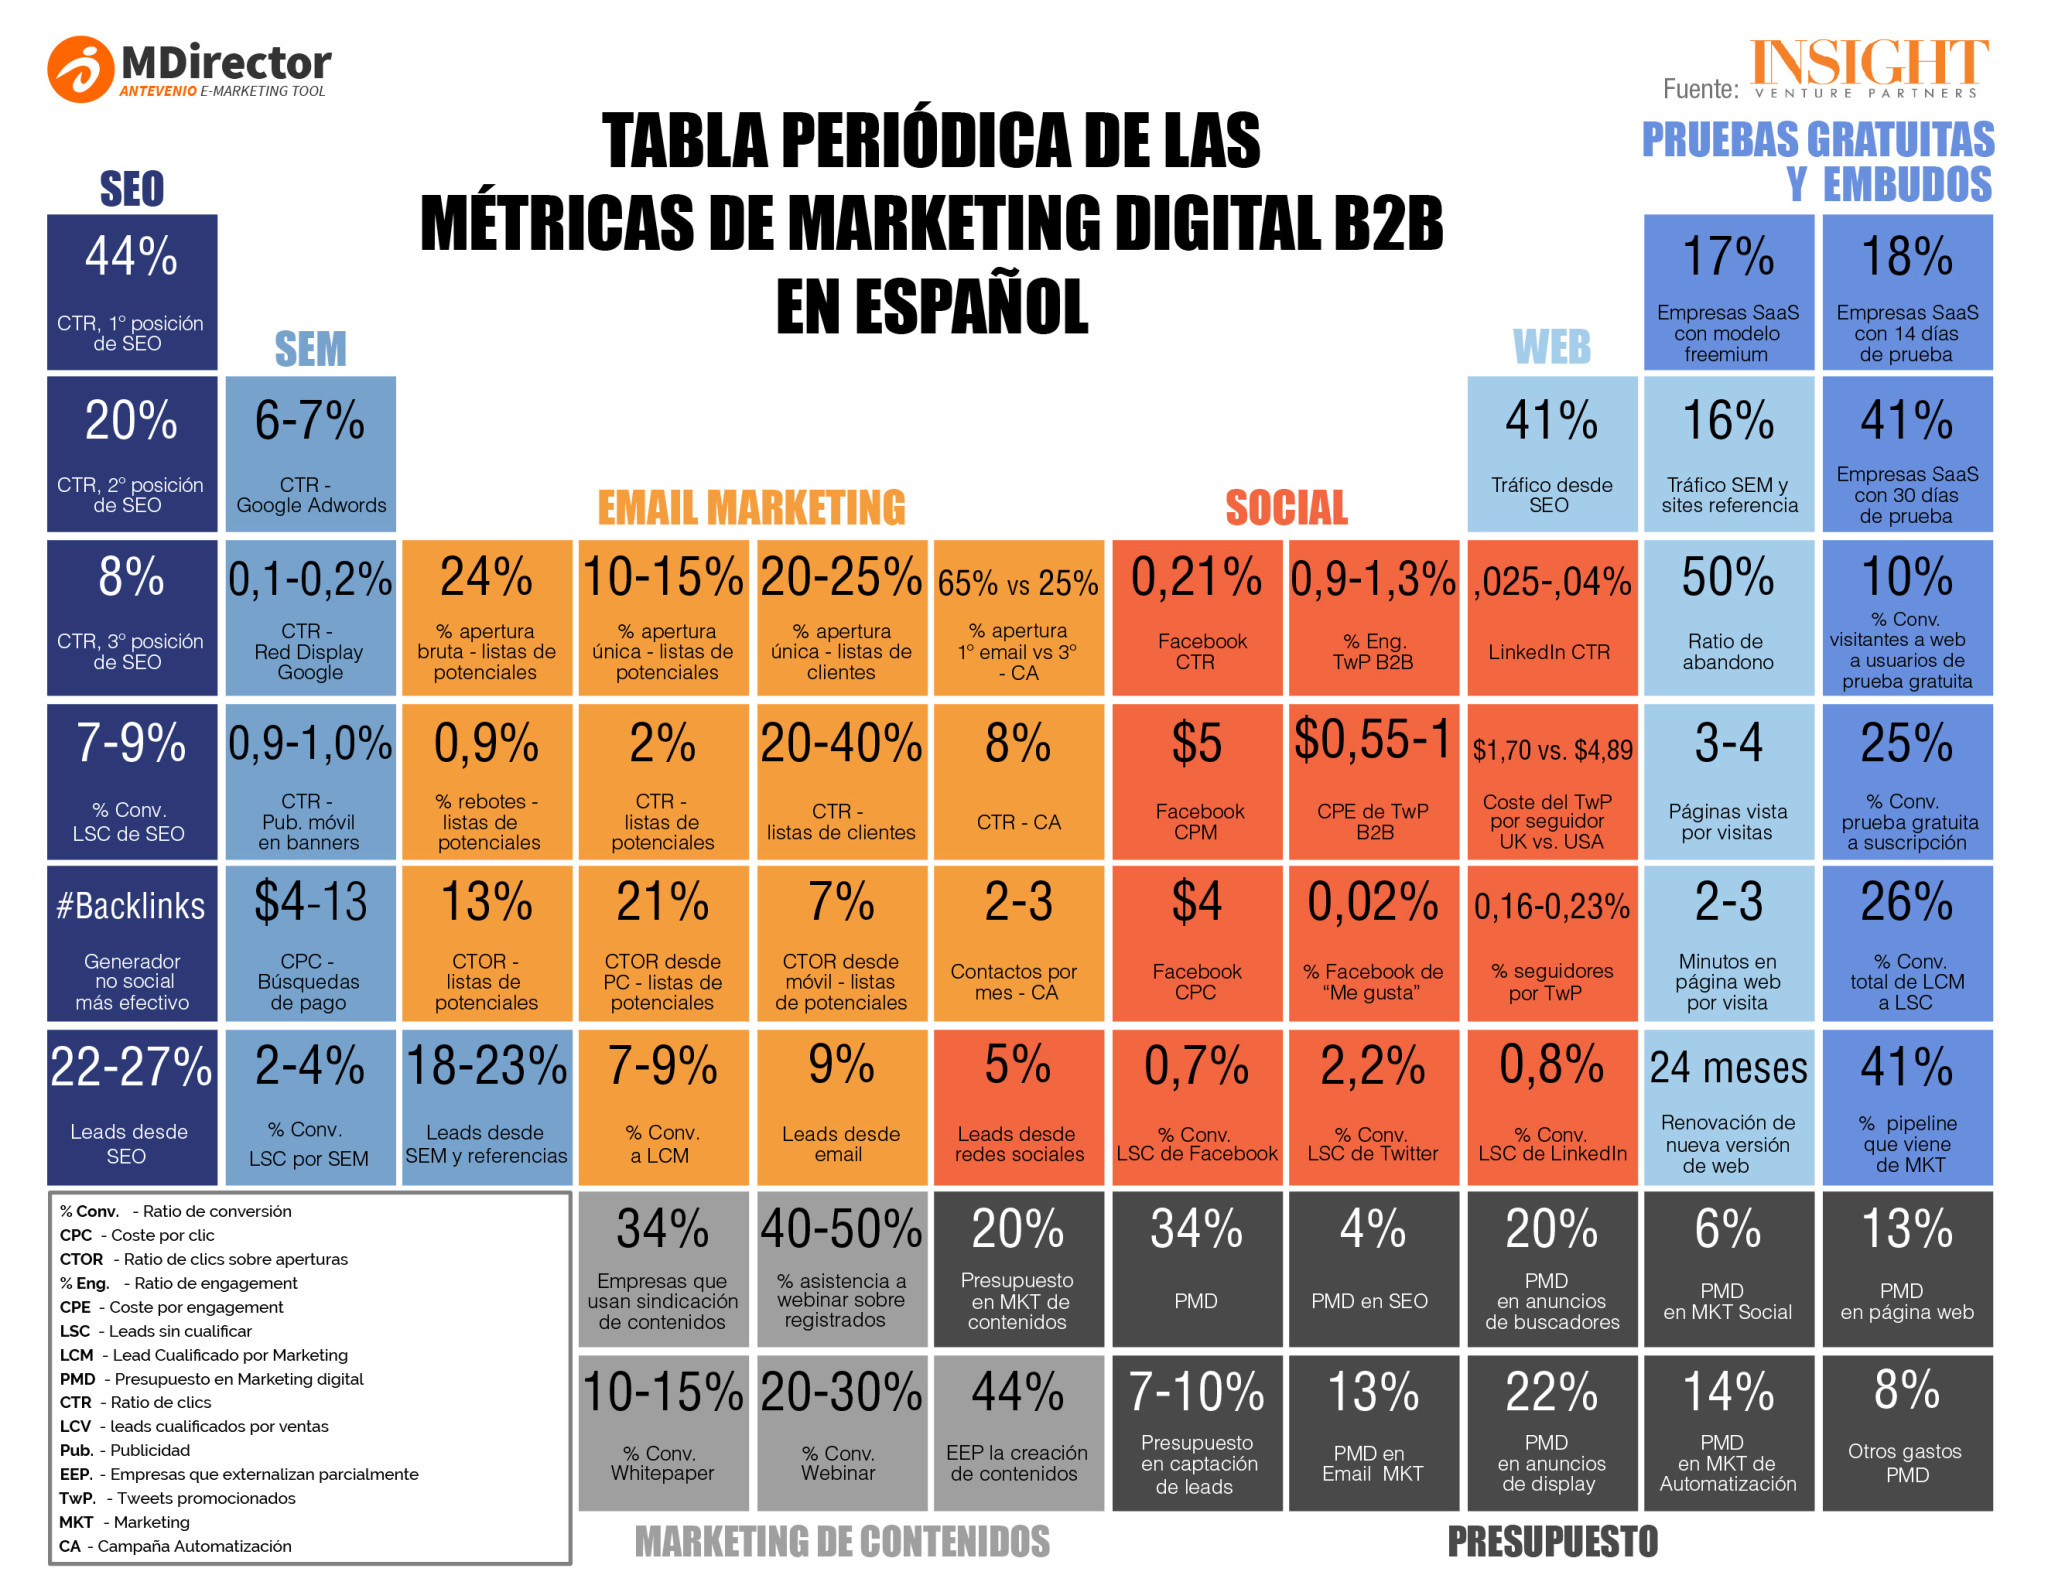 Tabla peridica de marketing digital b2b en espaol tabla de mtricas de marketing digital b2b urtaz Choice Image